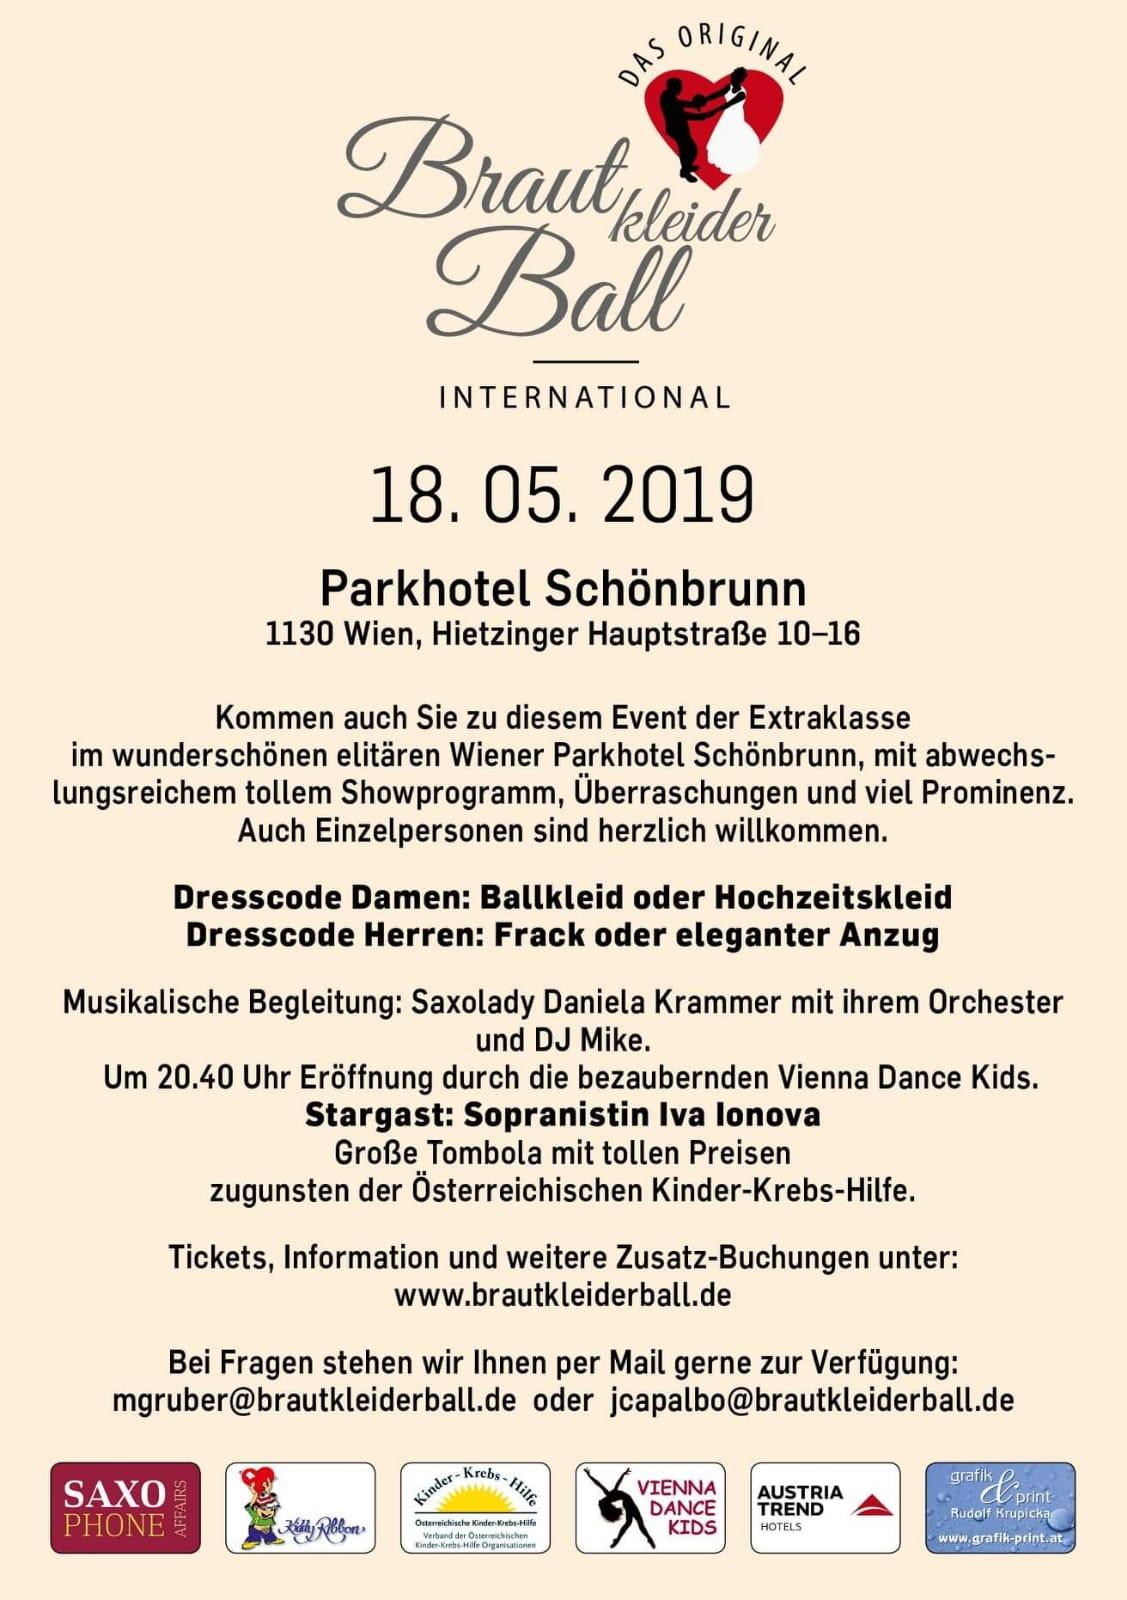 Brautkleiderball 2019